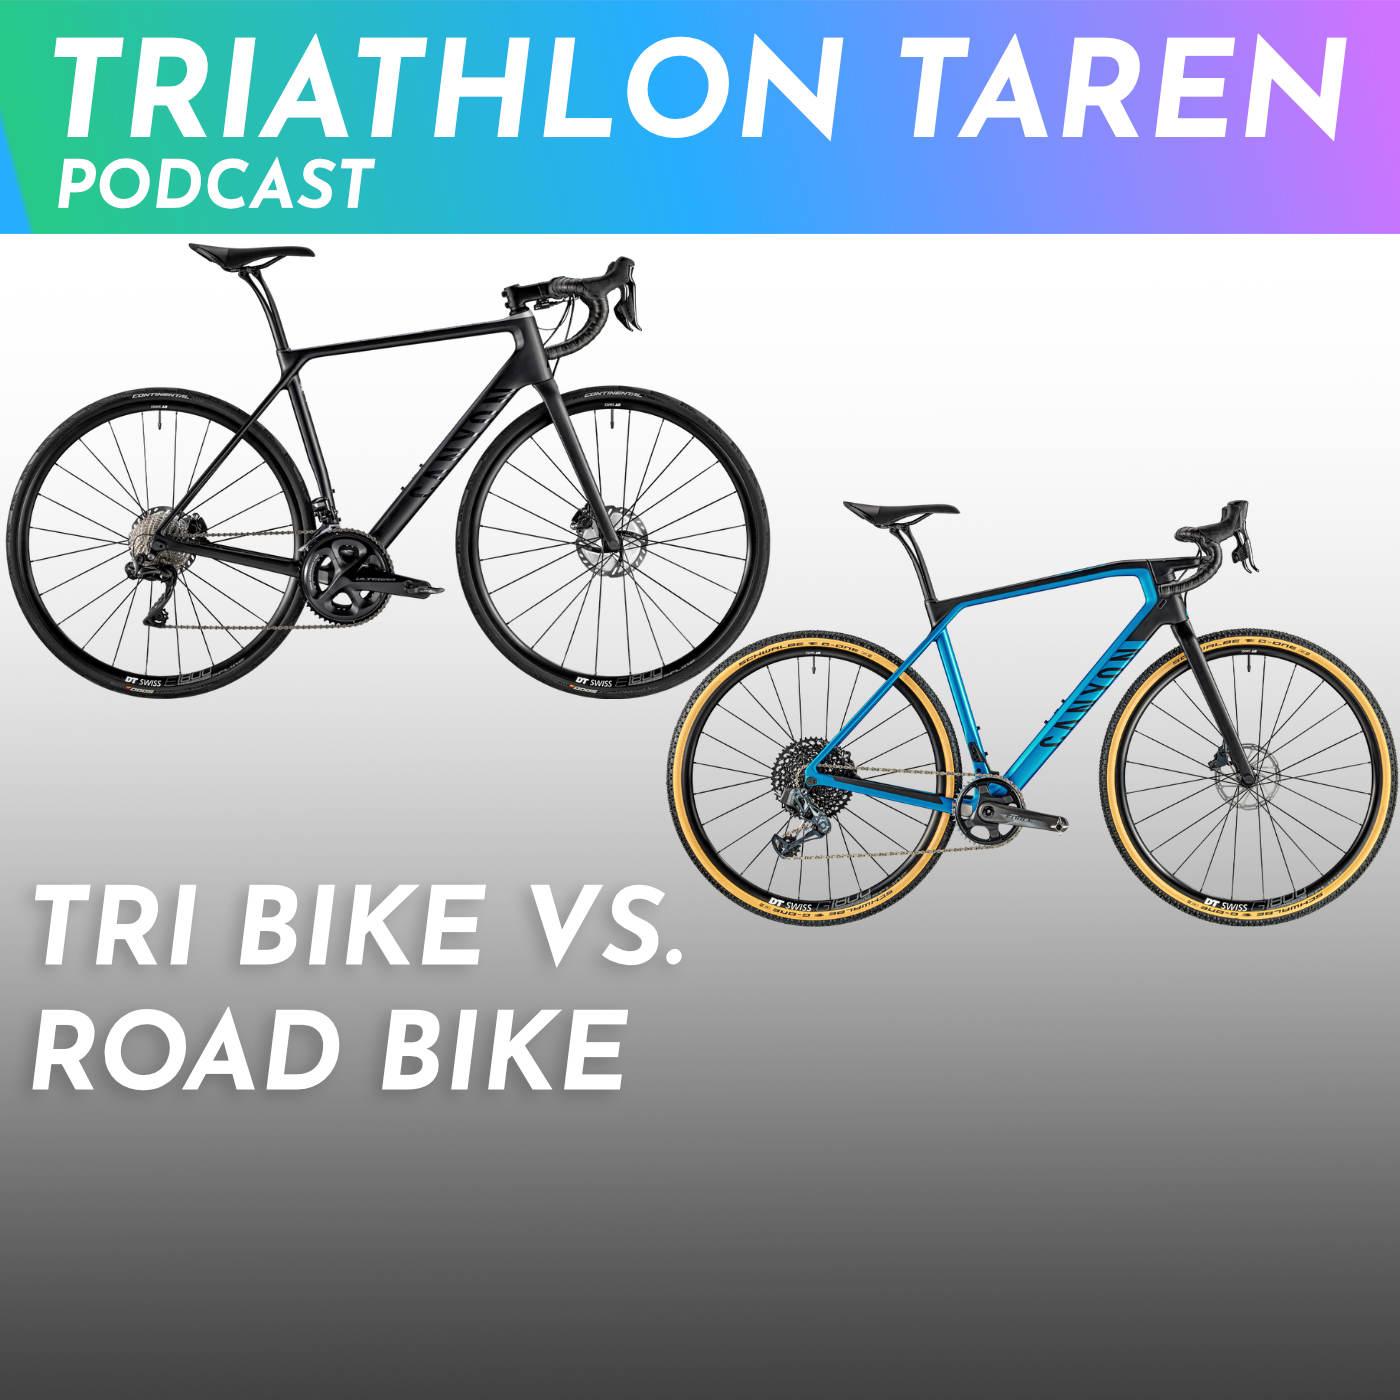 Tri Bike versus Road Bike